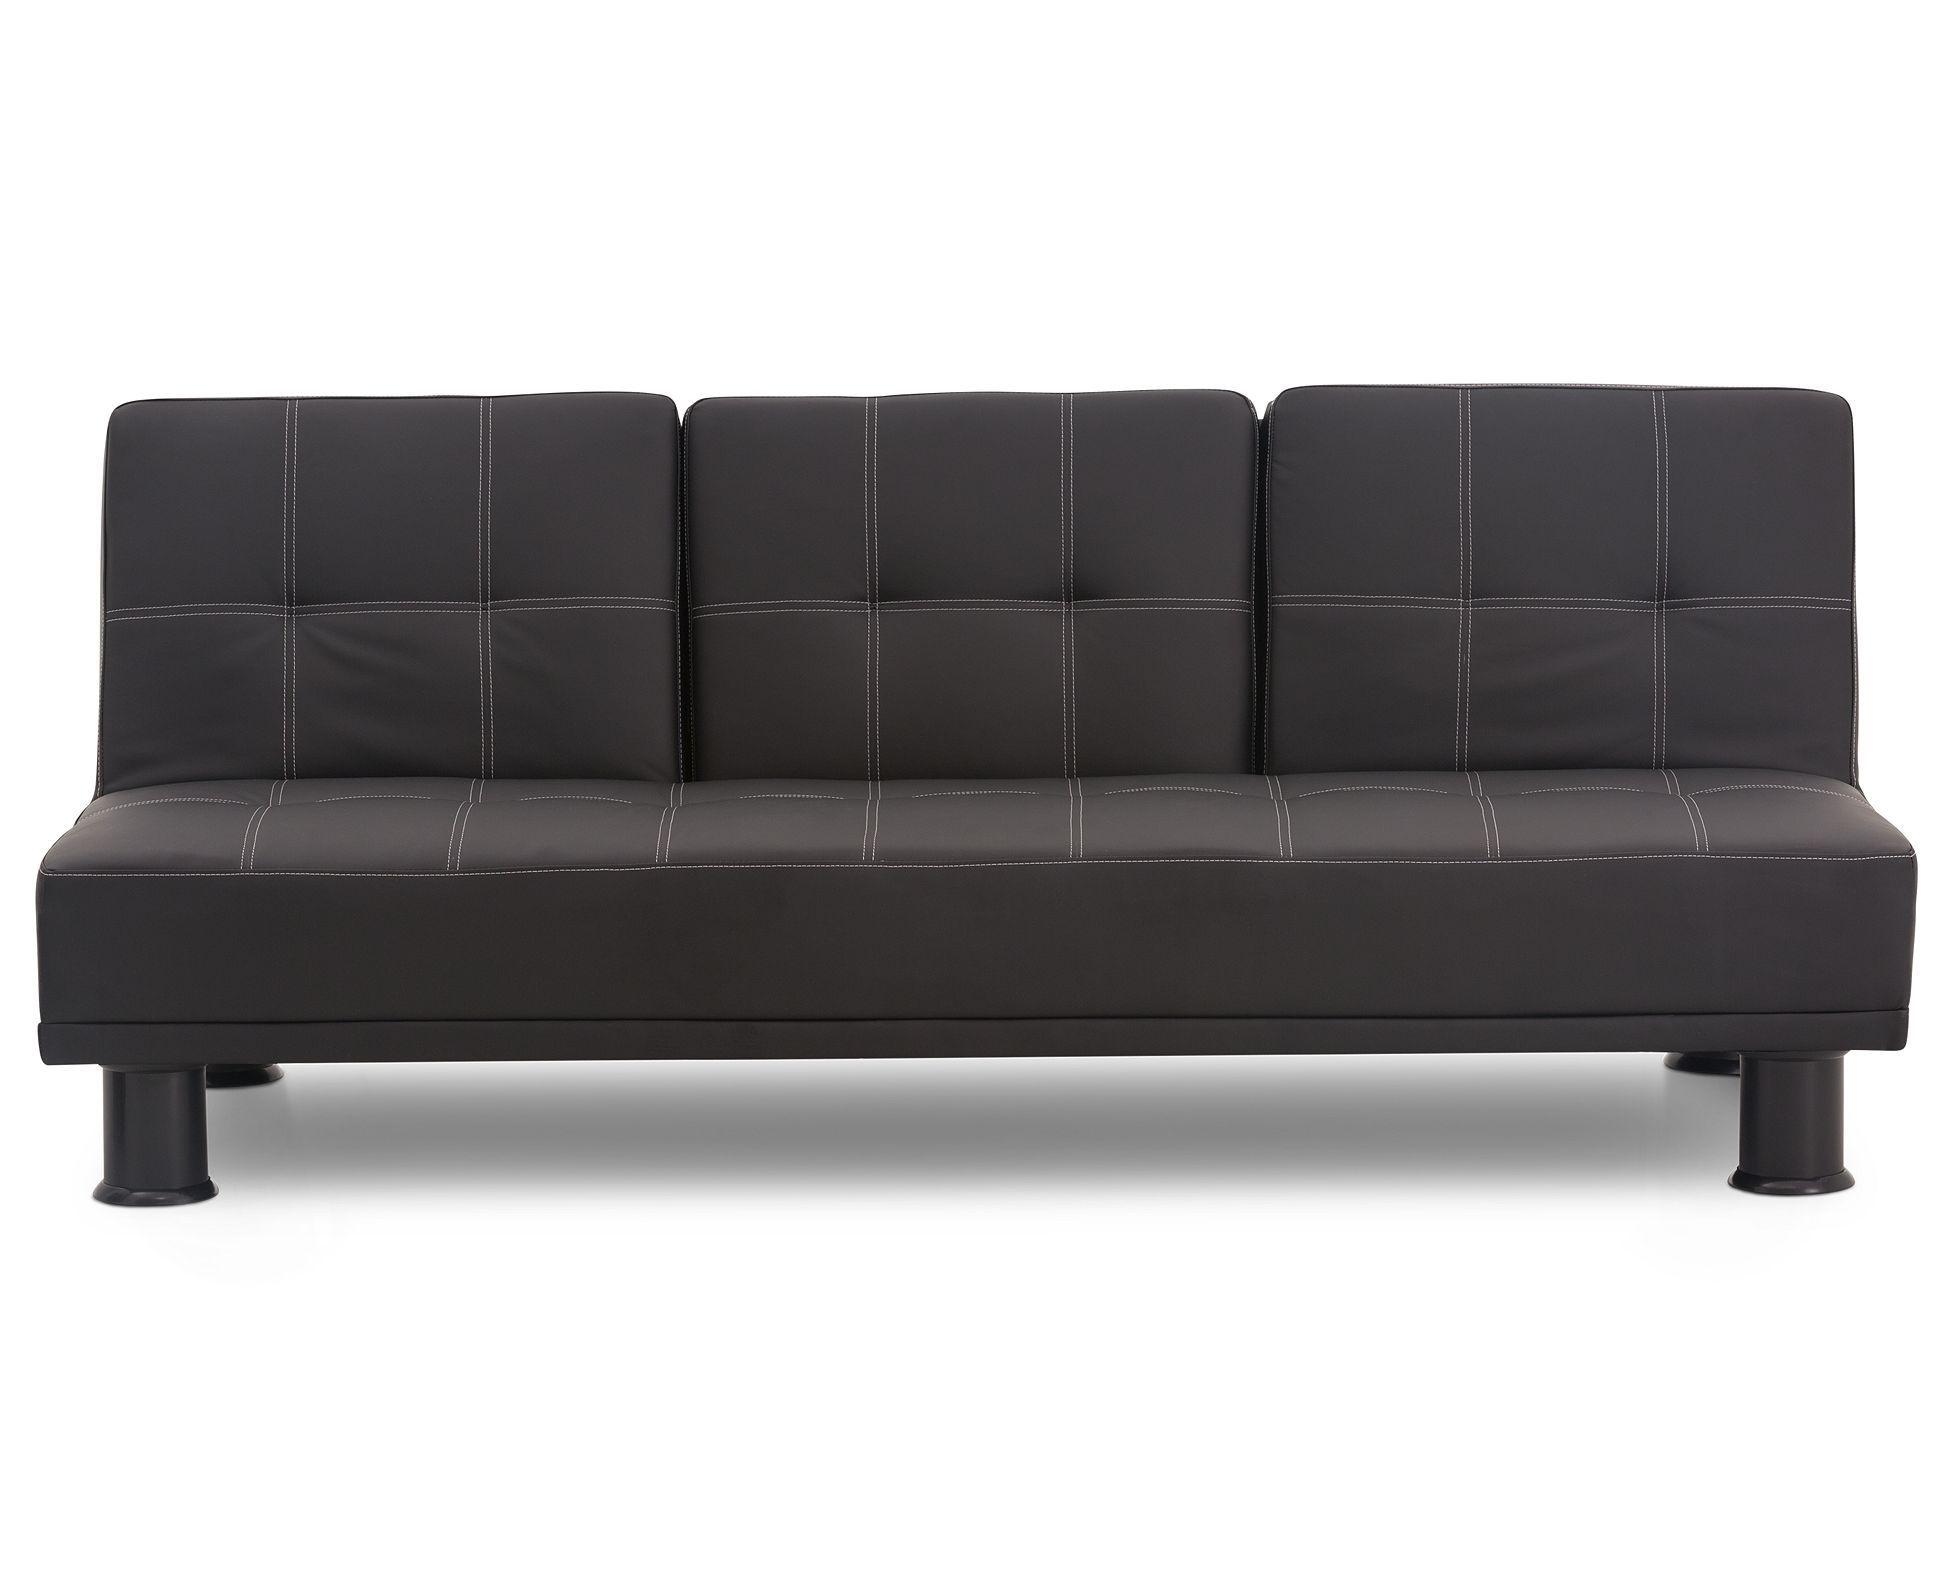 Black Friday Save 50 On The Brooke Futon Now 199 Blackfriday Furniturerow